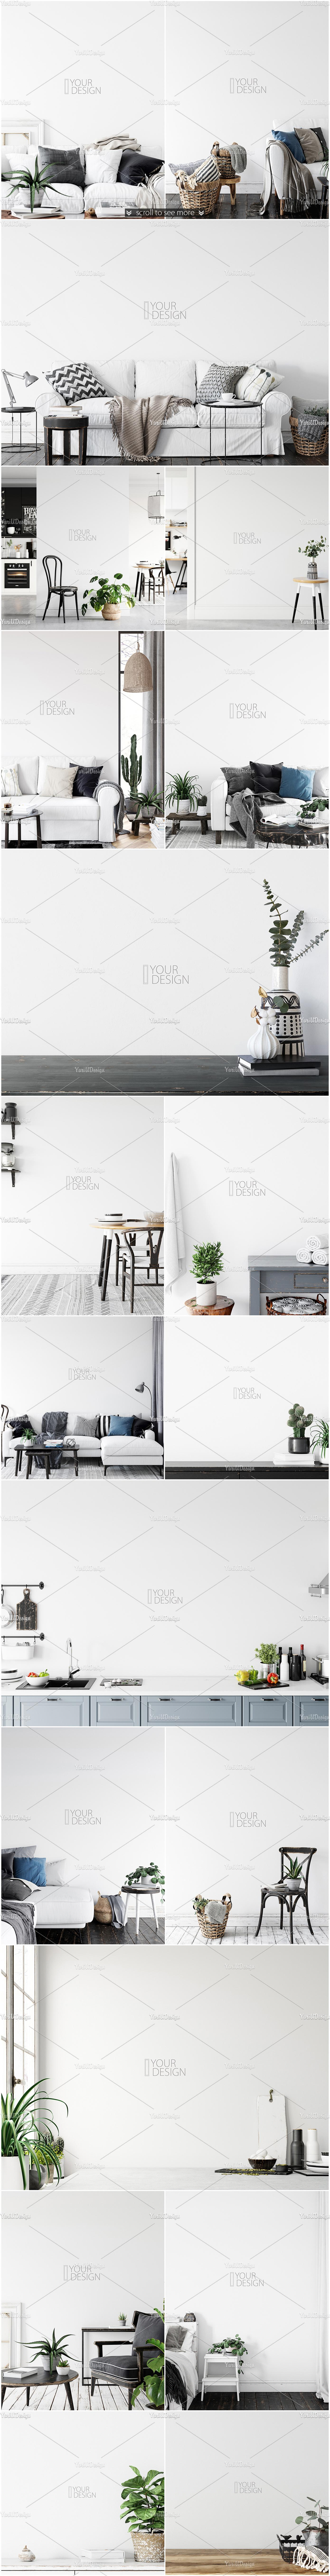 Scandinavian Interior Frames & Walls Mockup Bundle - 3 example image 8